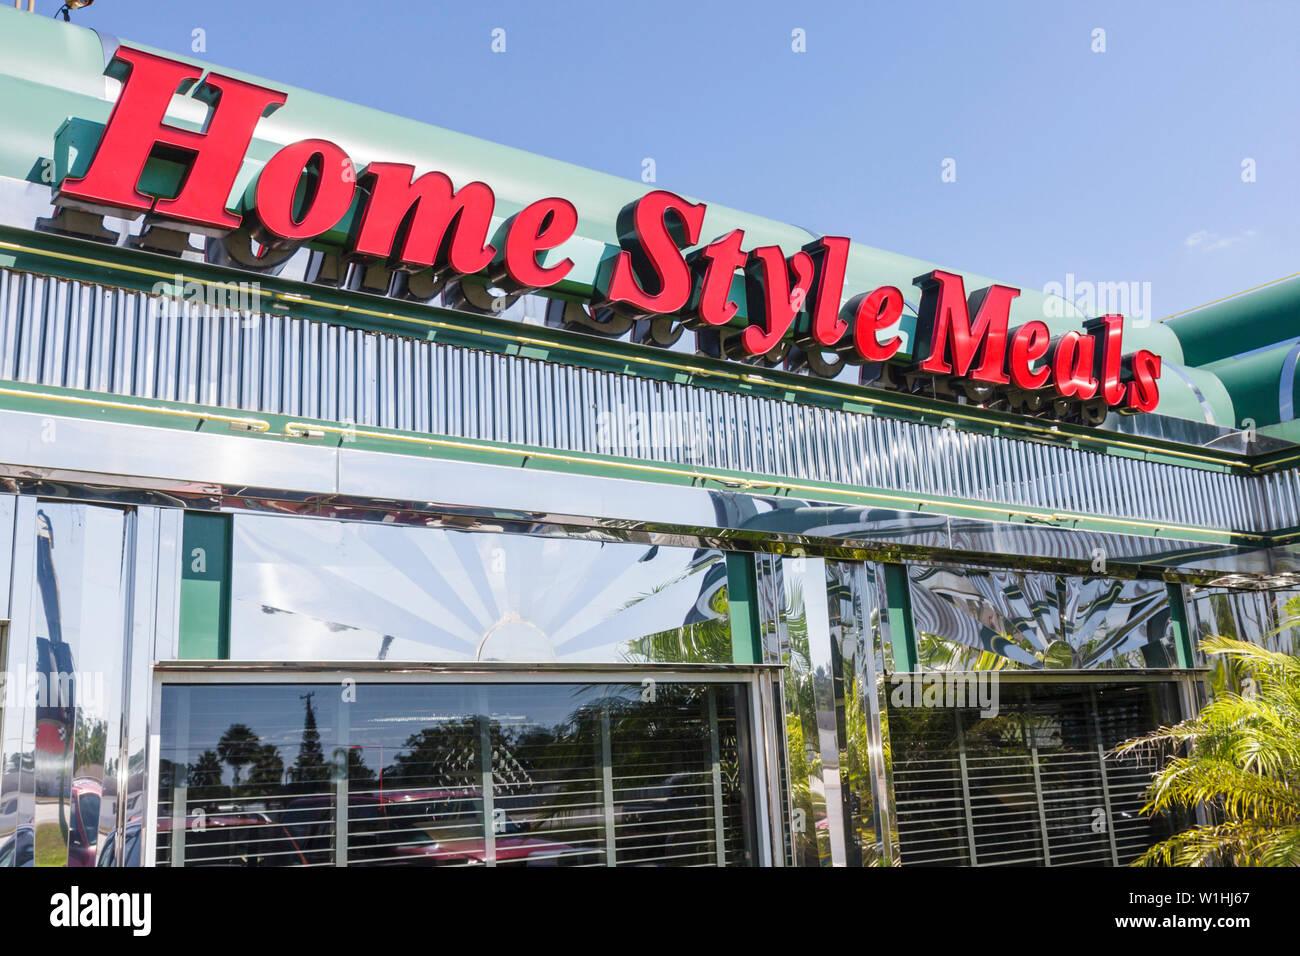 Florida Sebring Sebring US Route 27 Diner nostalgia restaurante informal de negocios home comidas estilo Americana signo de acero inoxidable Imagen De Stock